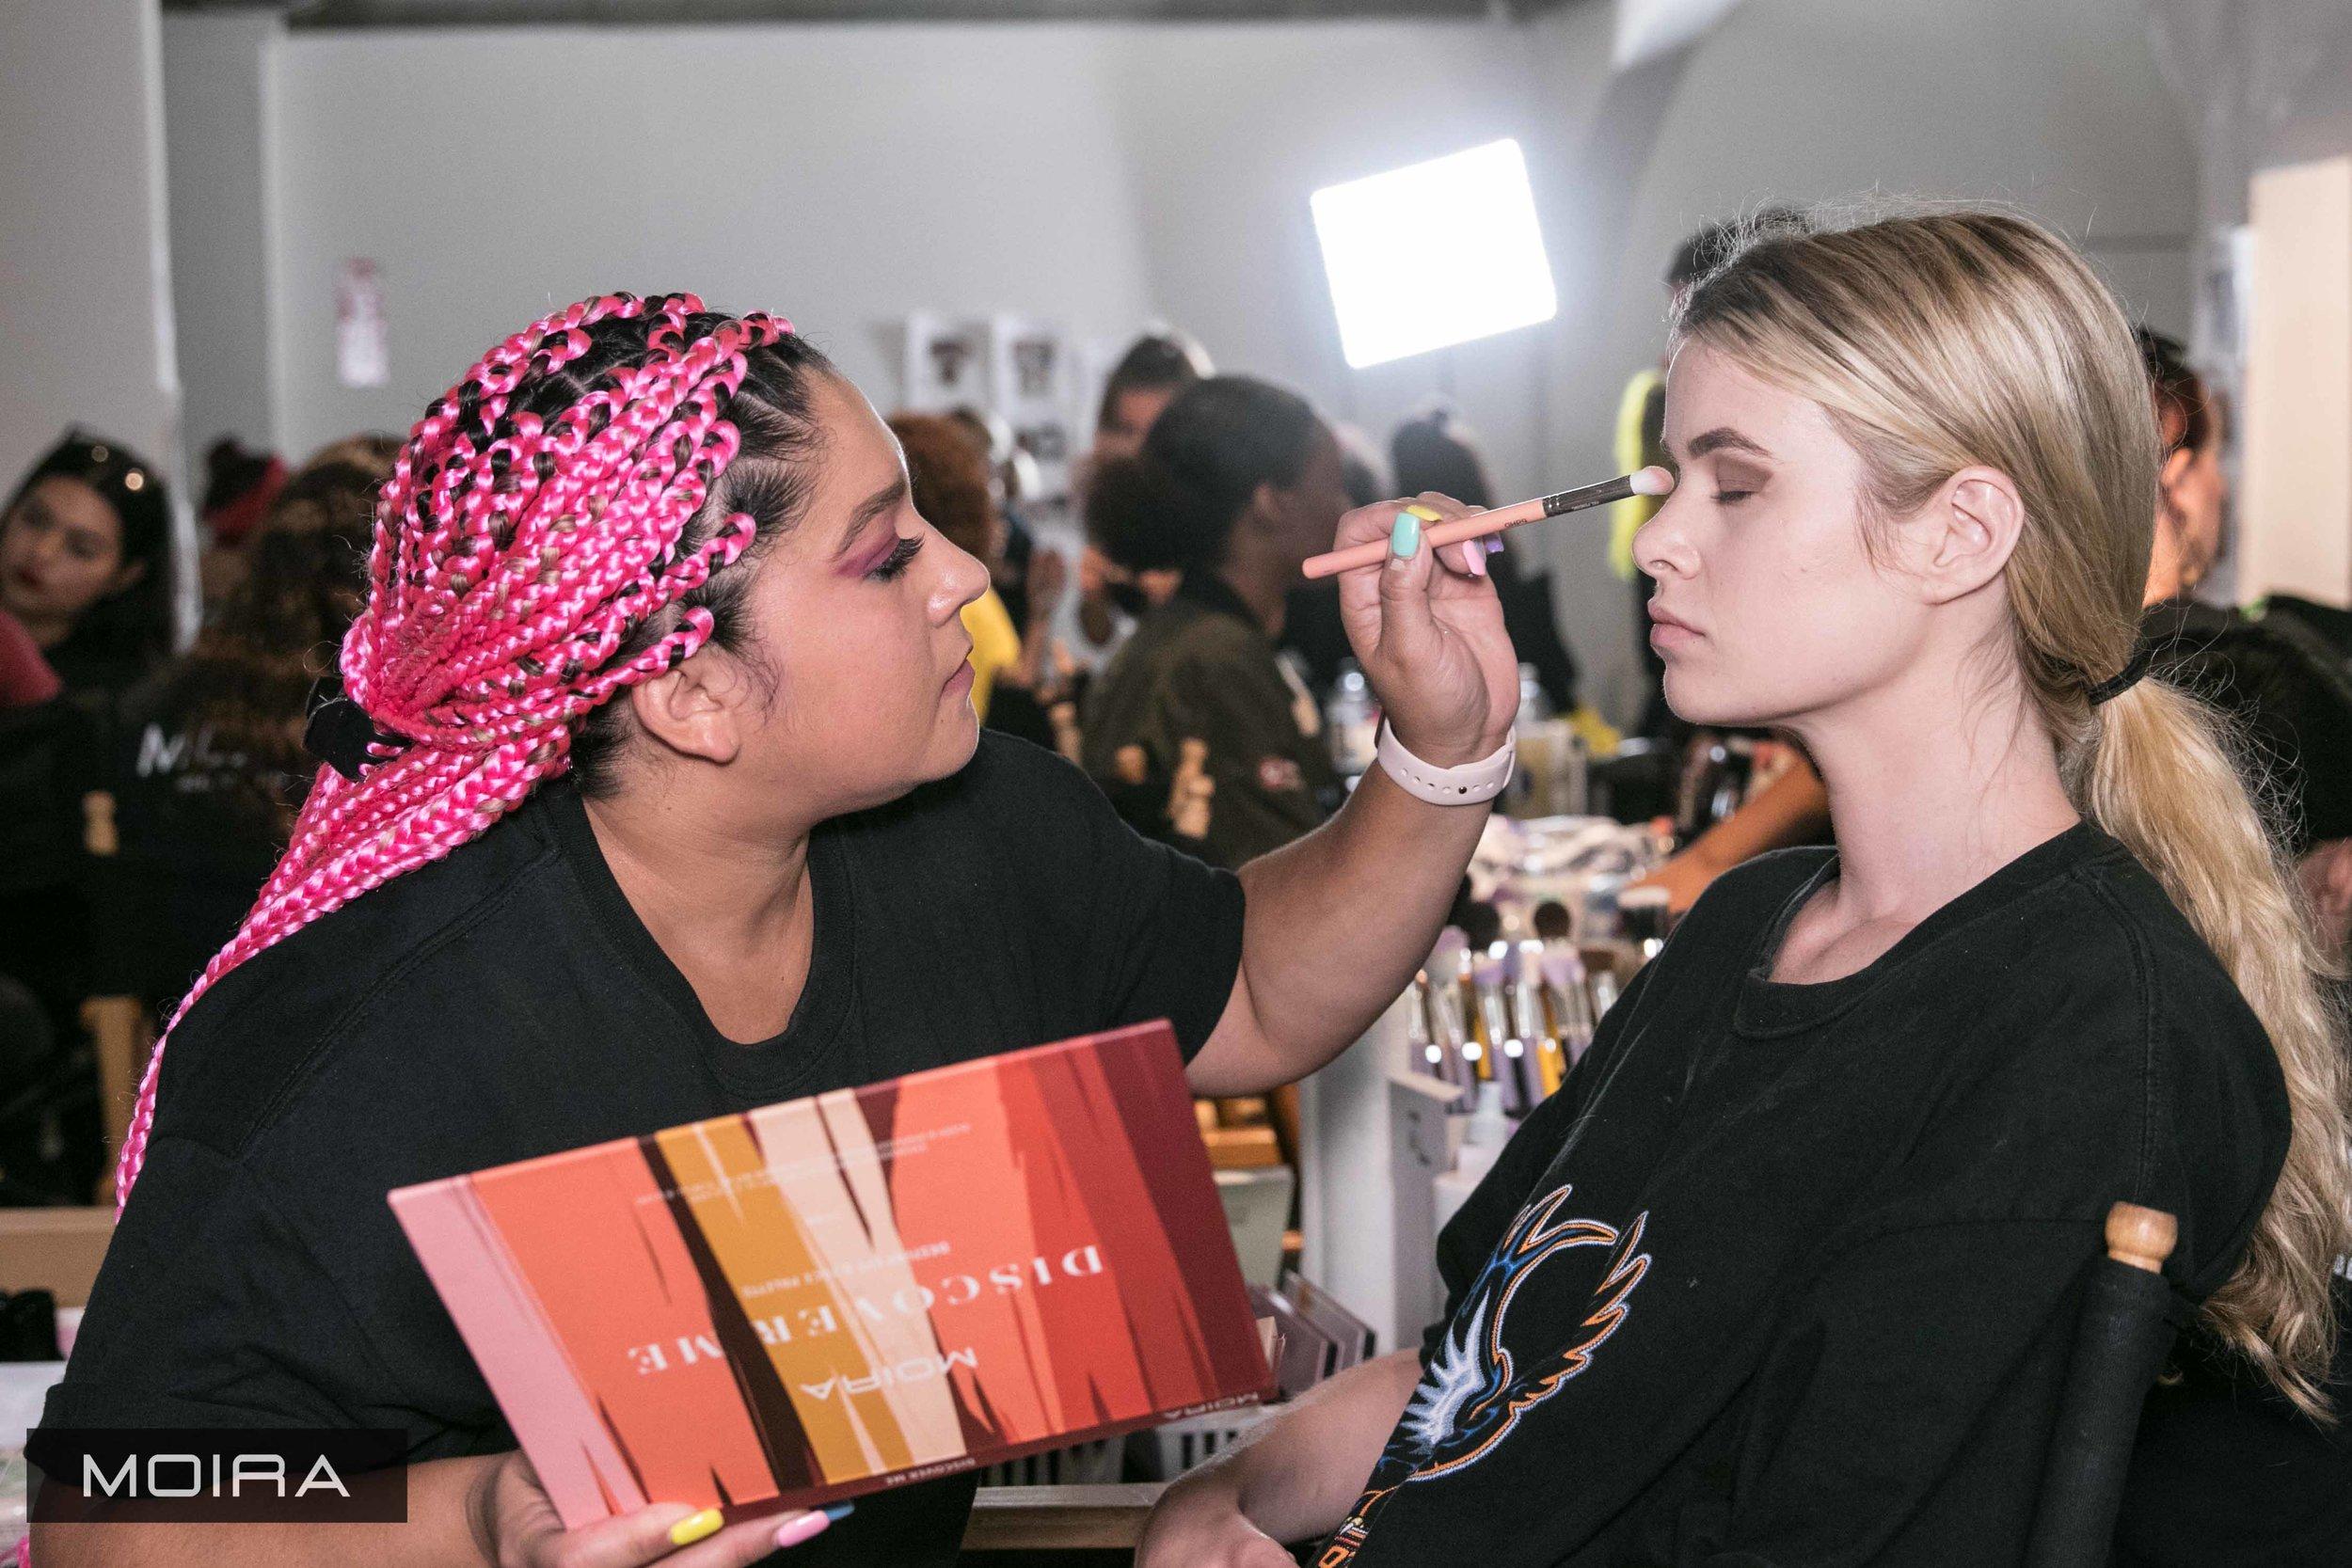 MOIRA_Cosmetics_New_York_Fashion_Week_2018-35.jpg